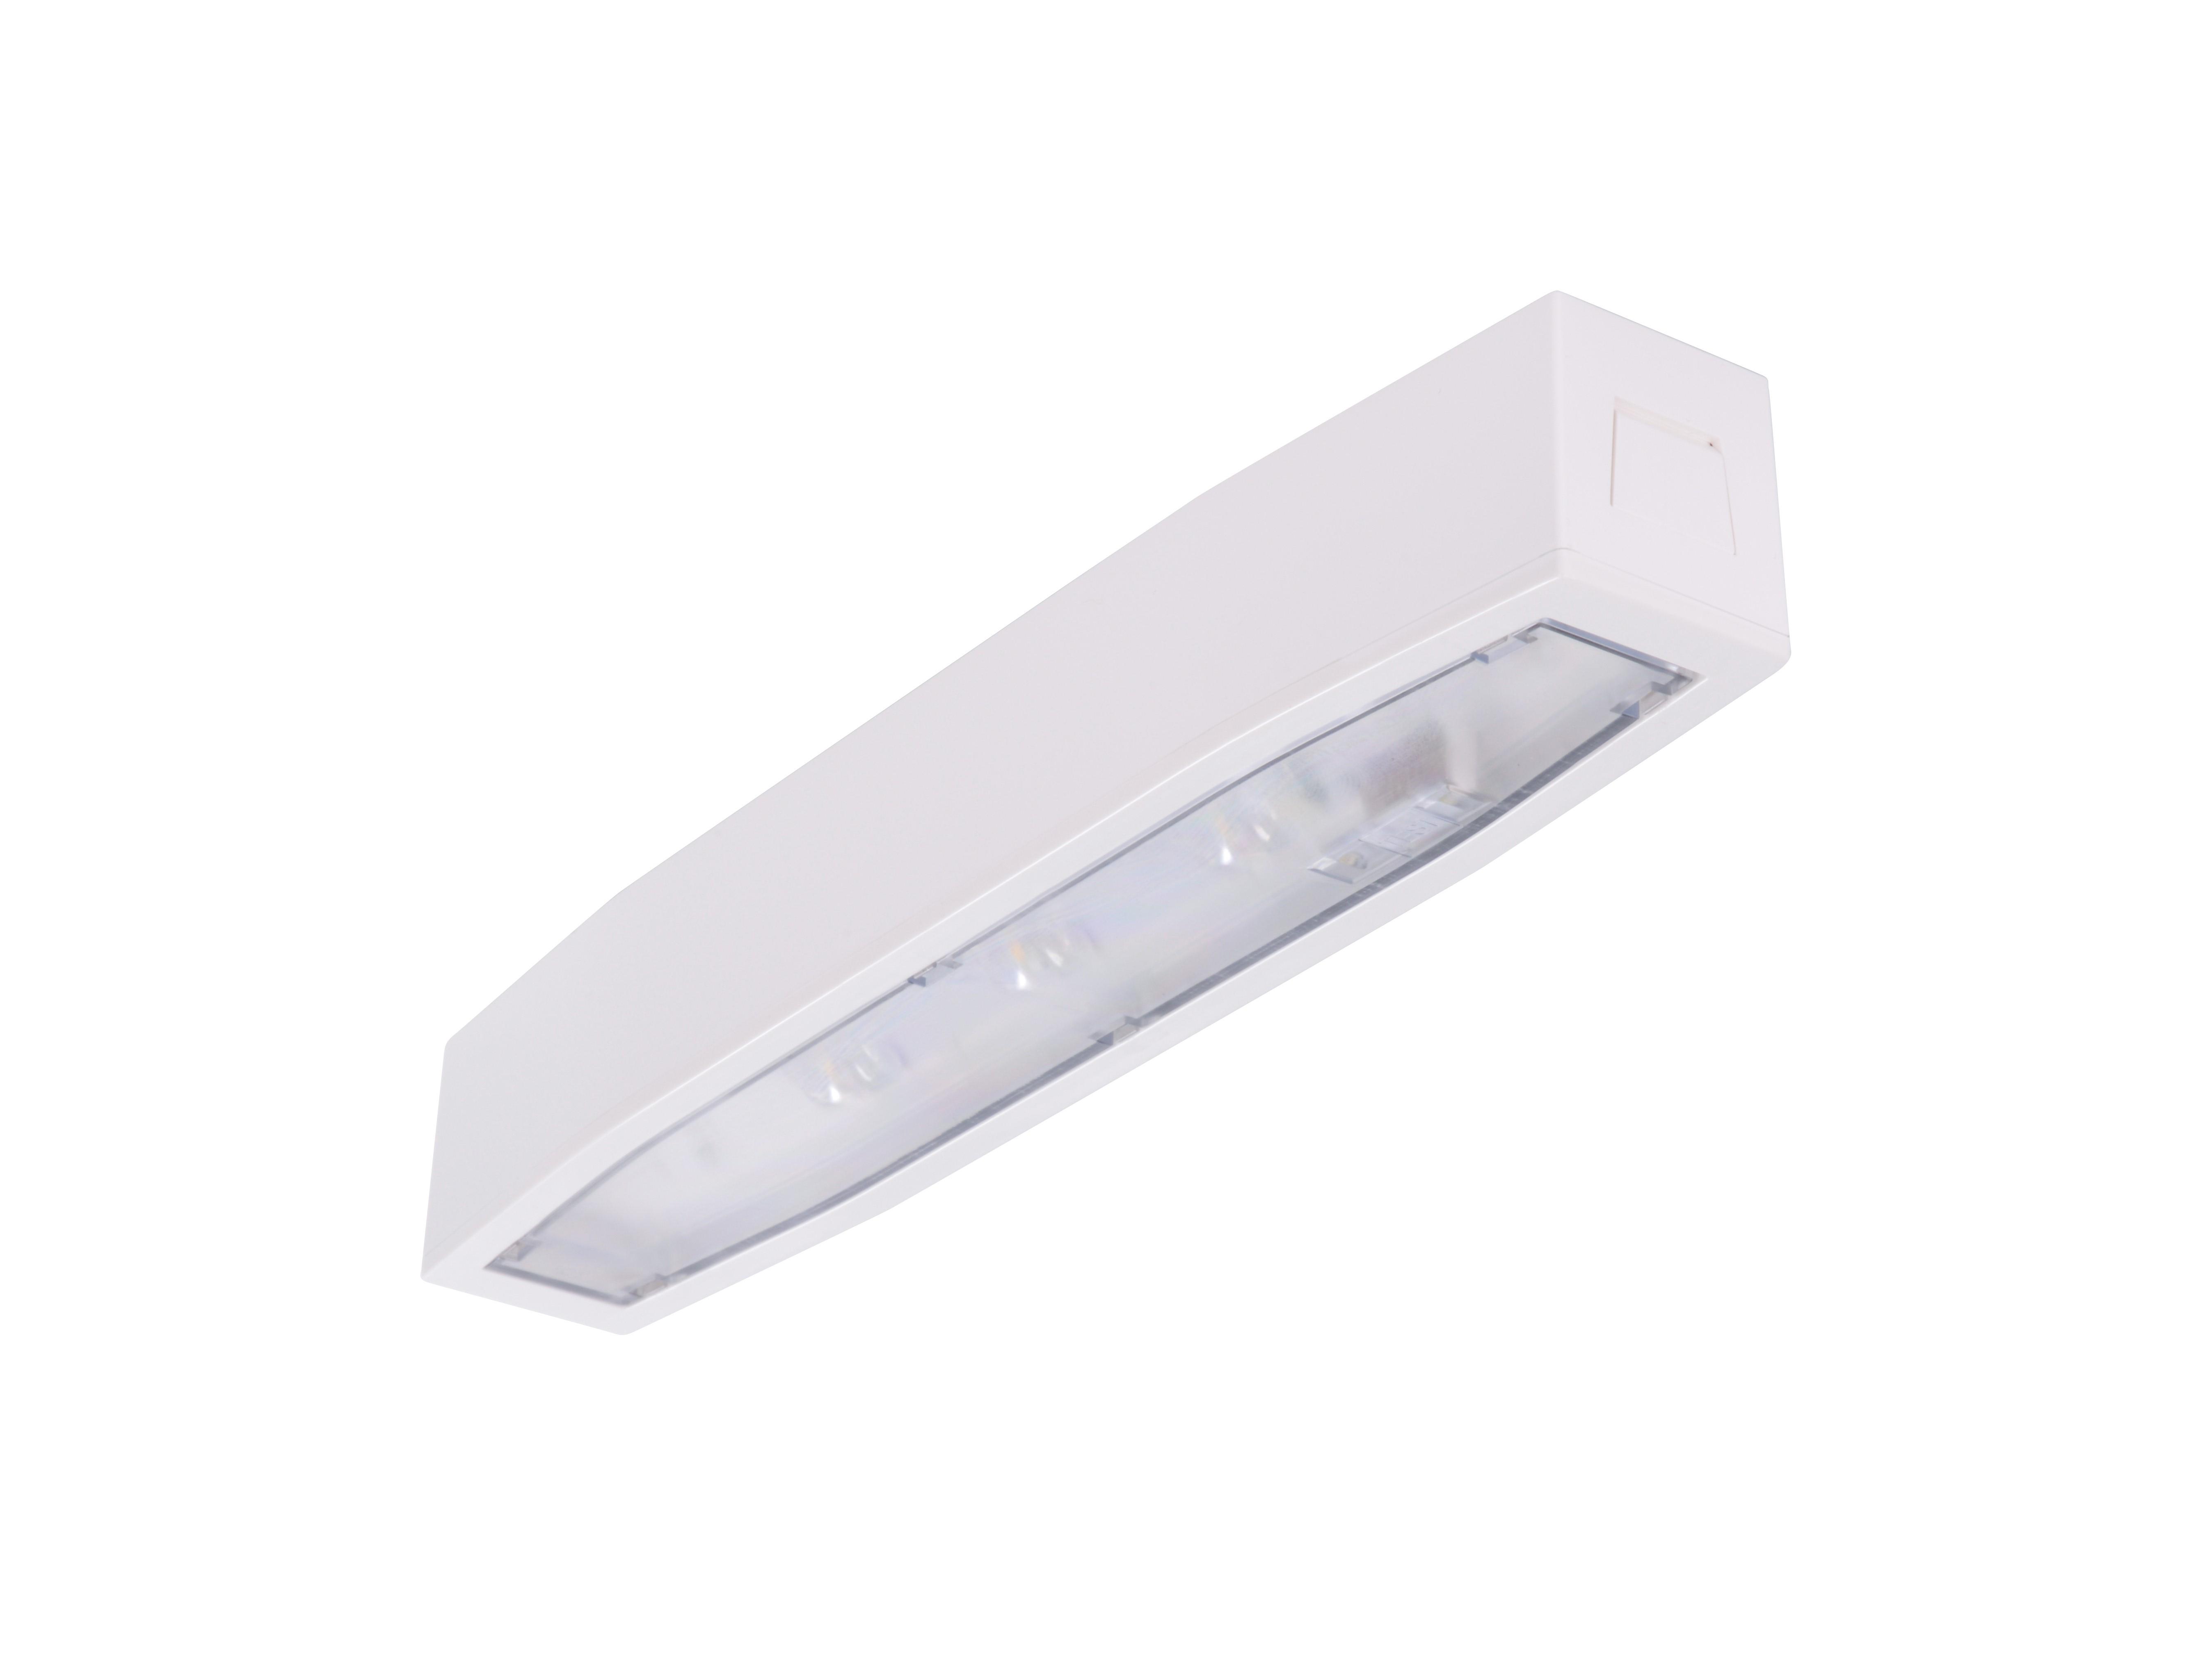 Lampa emergenta led Intelight 94767   3h nementinut test automat 0